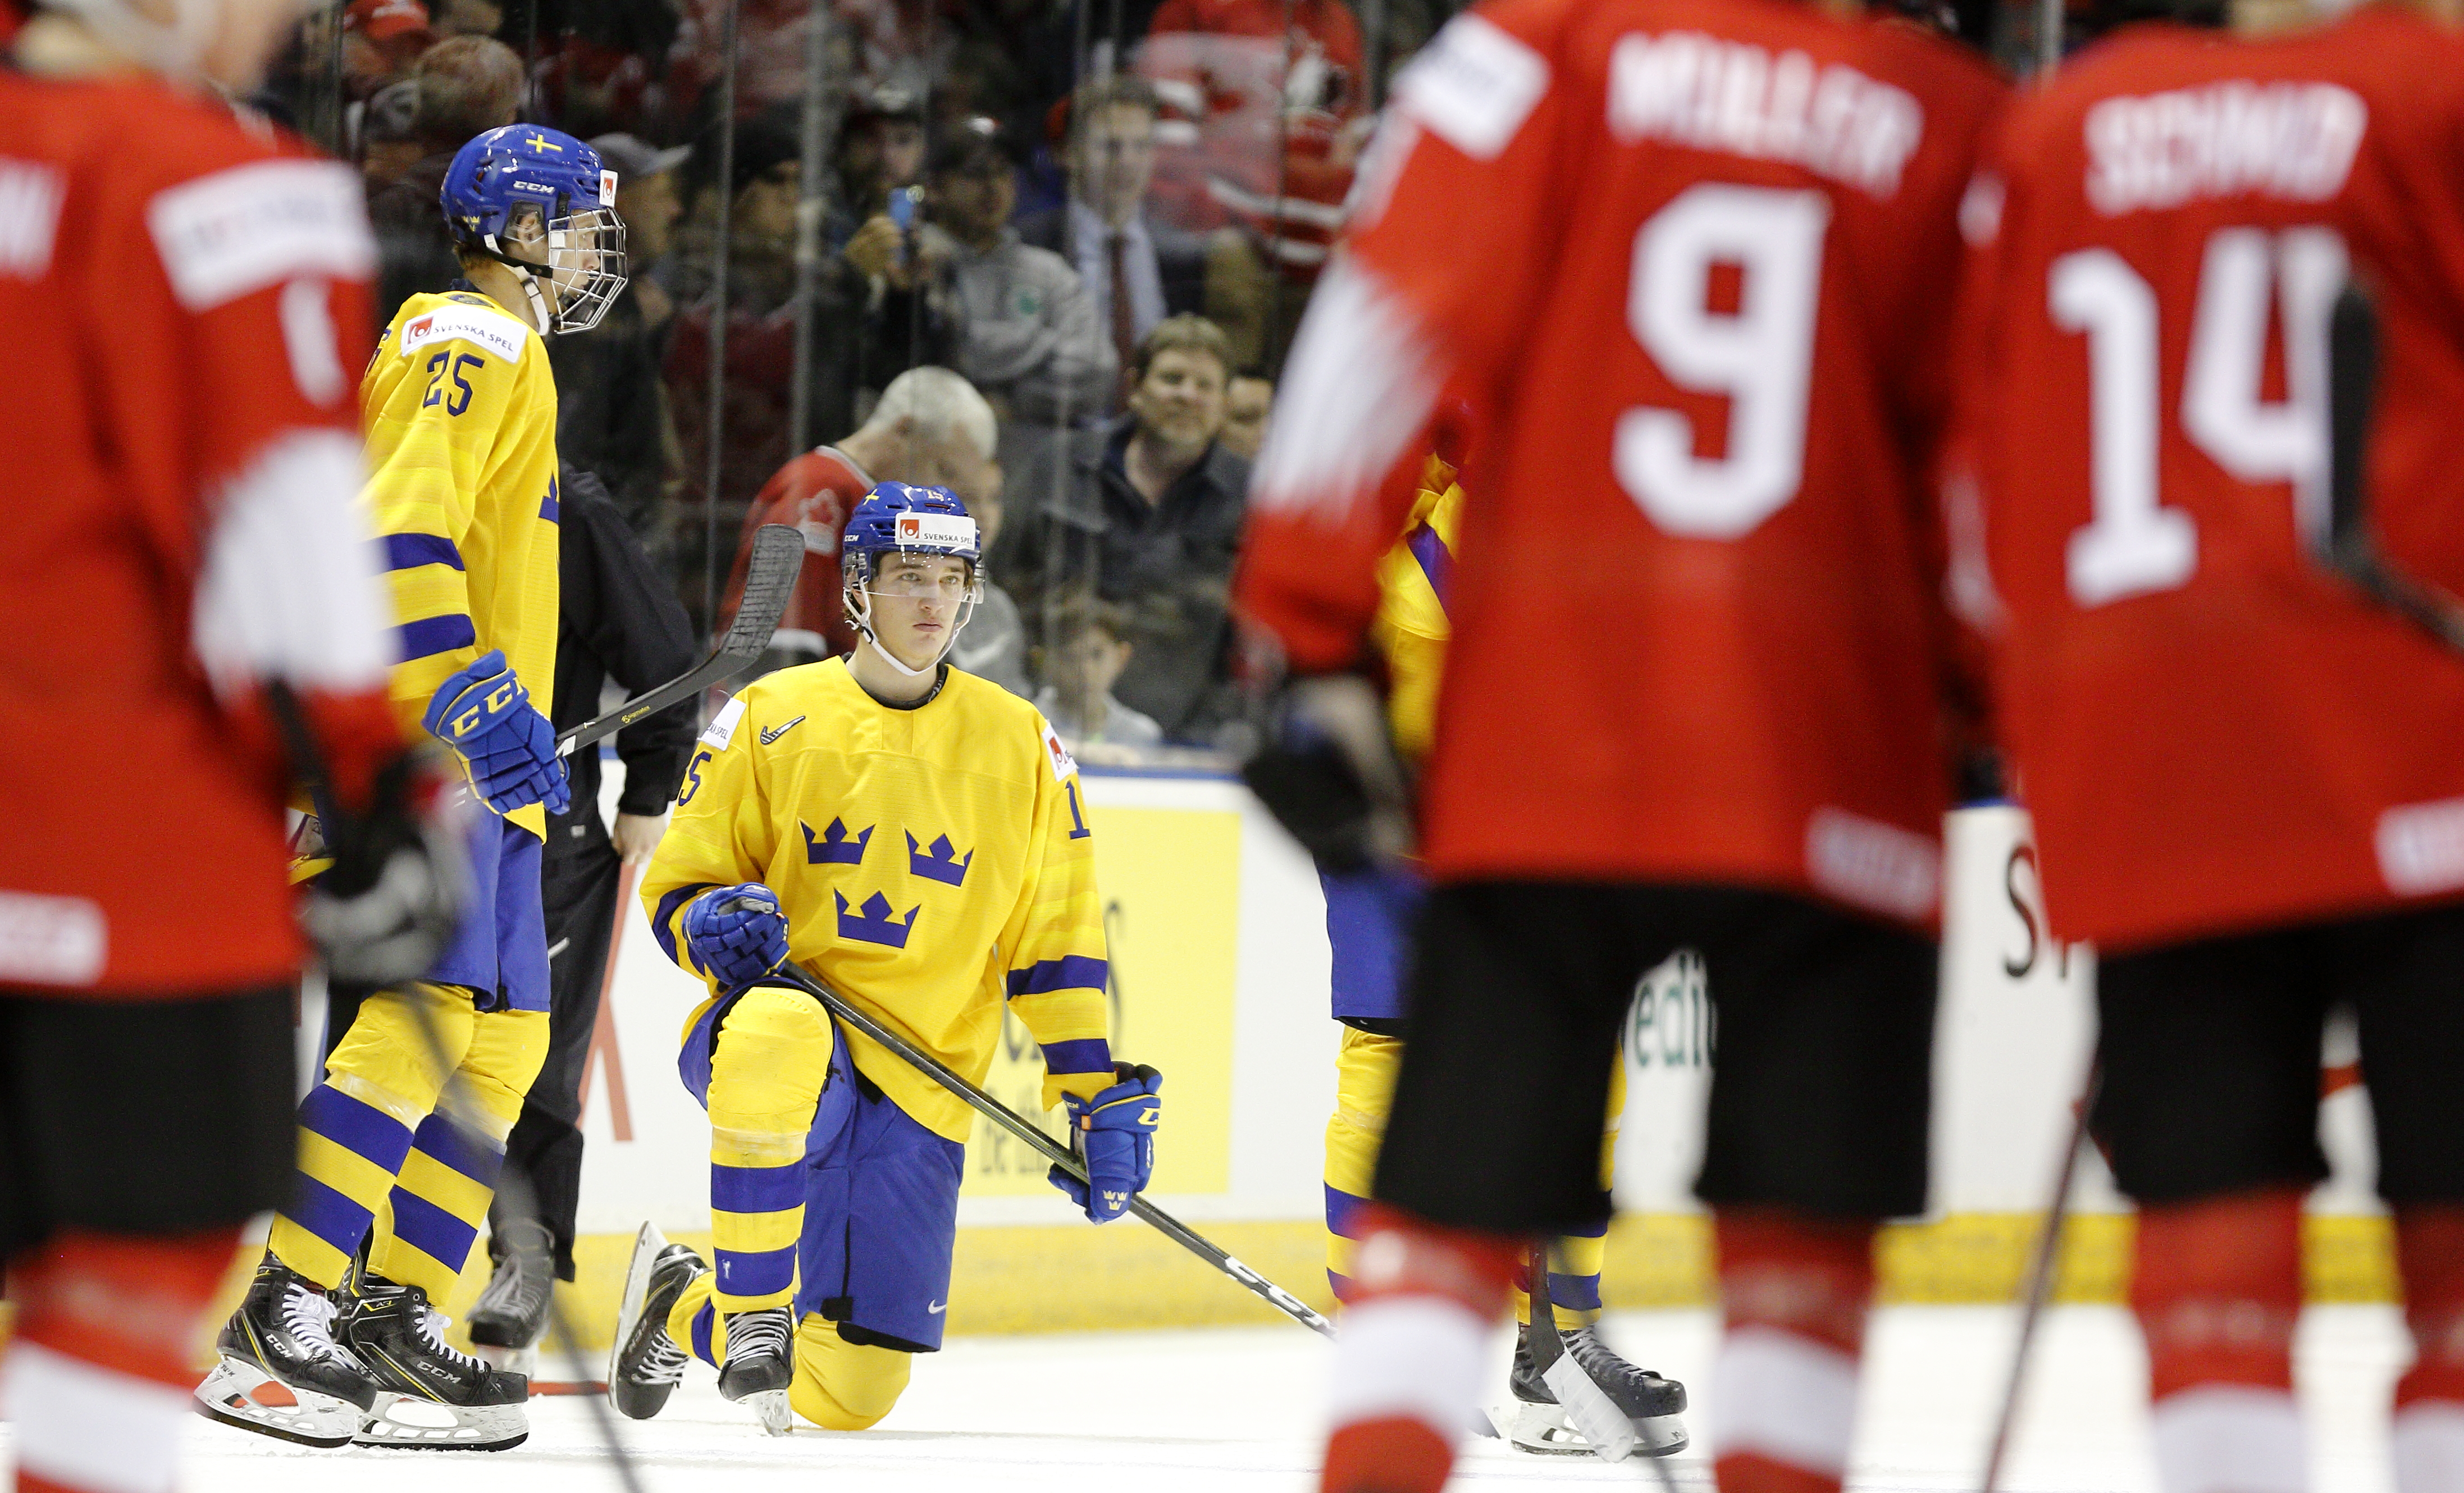 Sweden v Switzerland - 2019 IIHF World Junior Championship